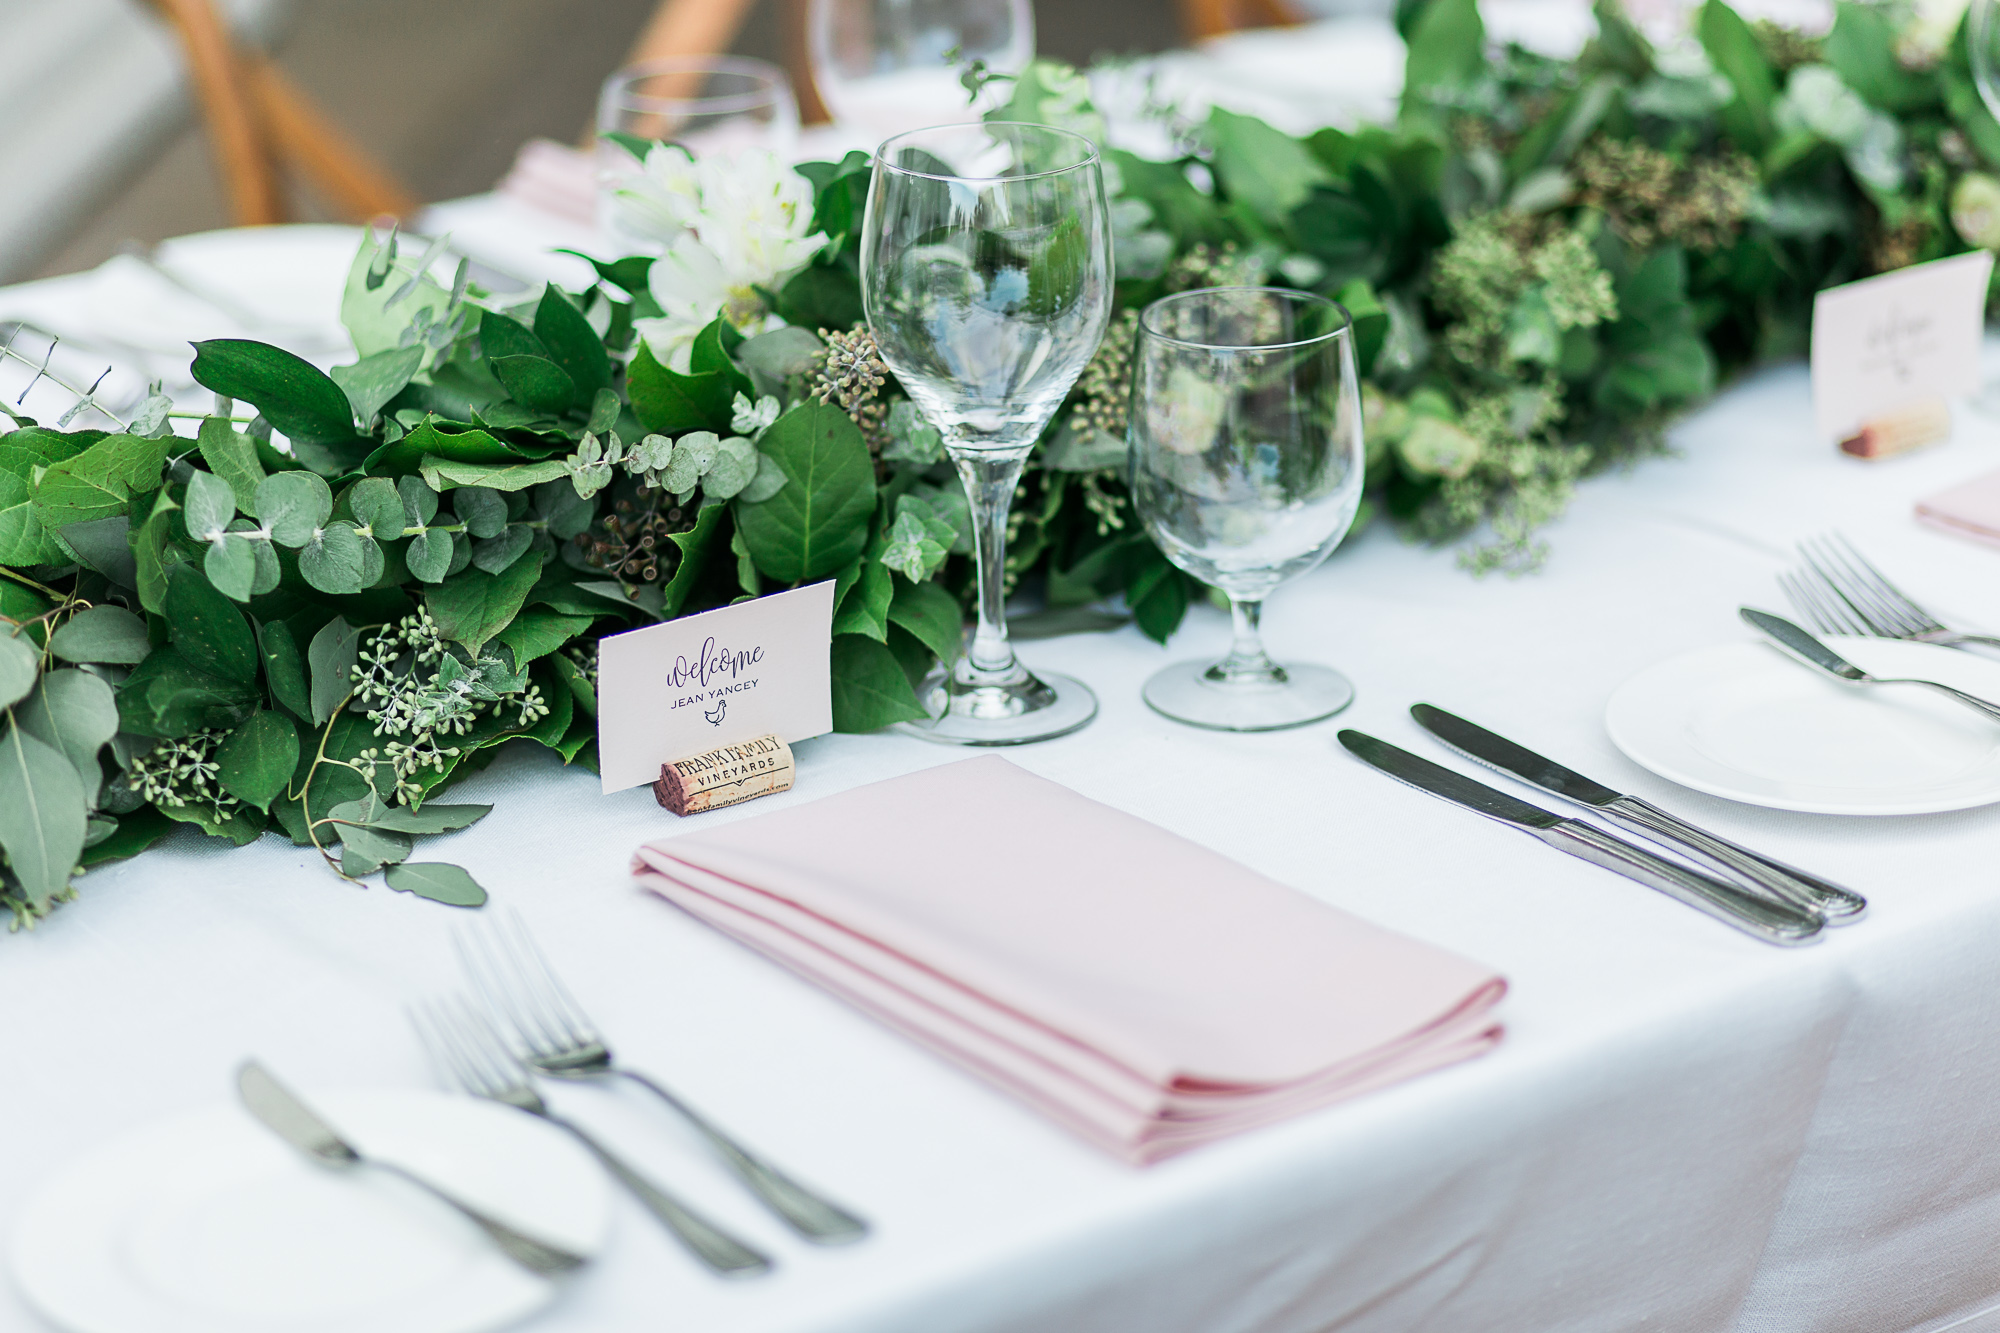 Generals+Daughter+Wedding+Photos+by+JBJ+Pictures+-+Ramekins+Wedding+Venue+Photographer+in+Sonoma+Napa+(24).jpg